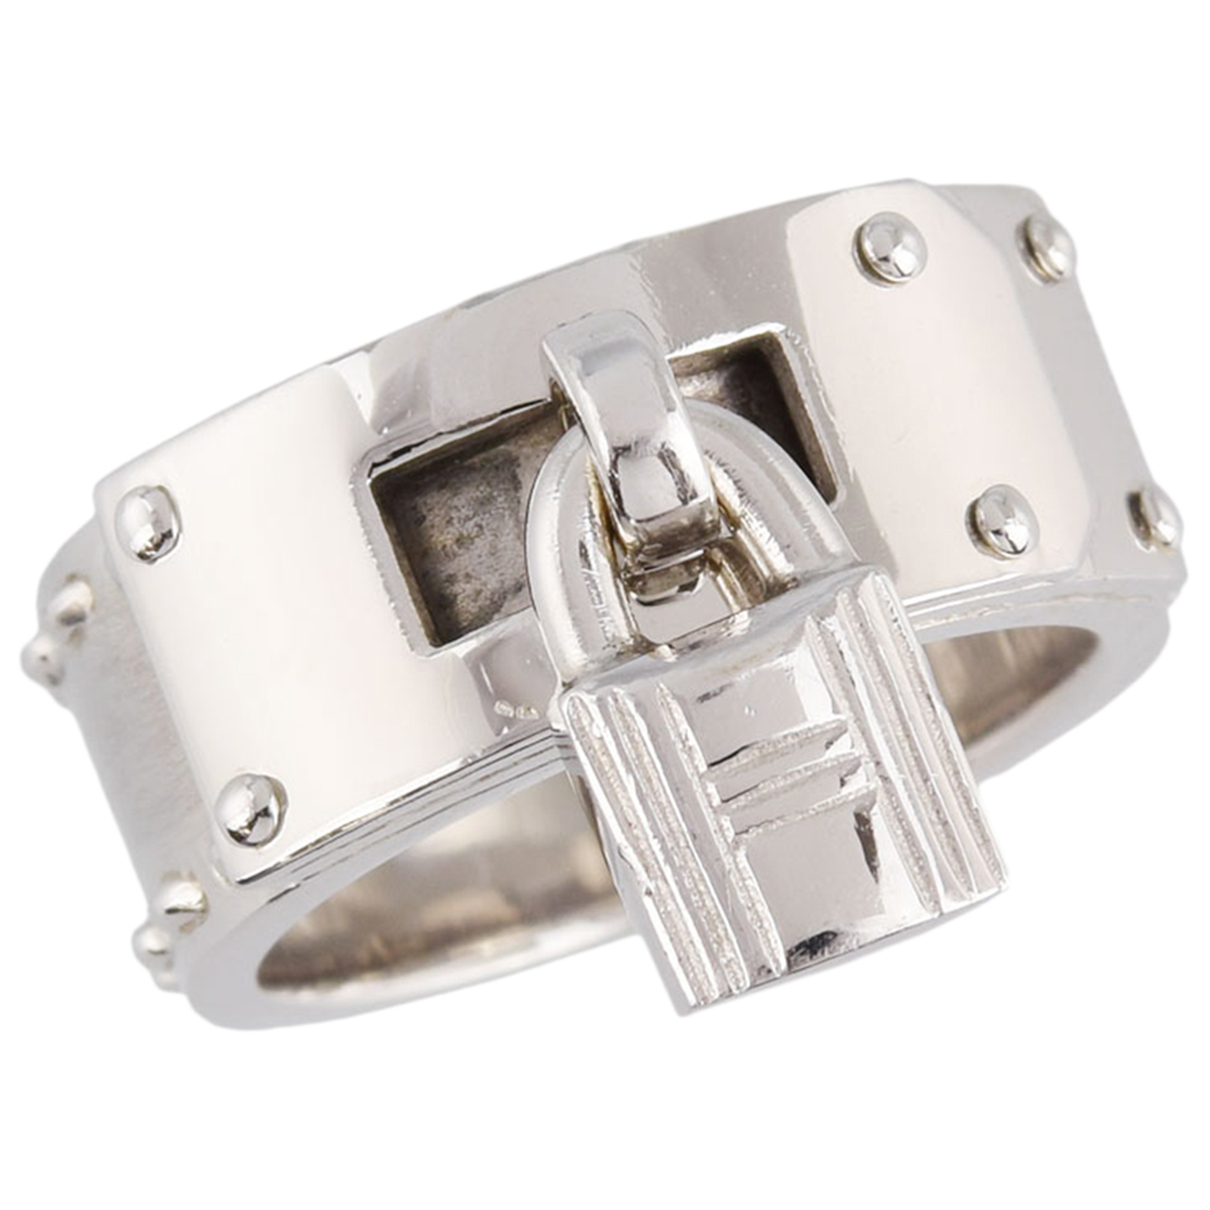 Hermes - Bague Kelly pour femme en or blanc - argente